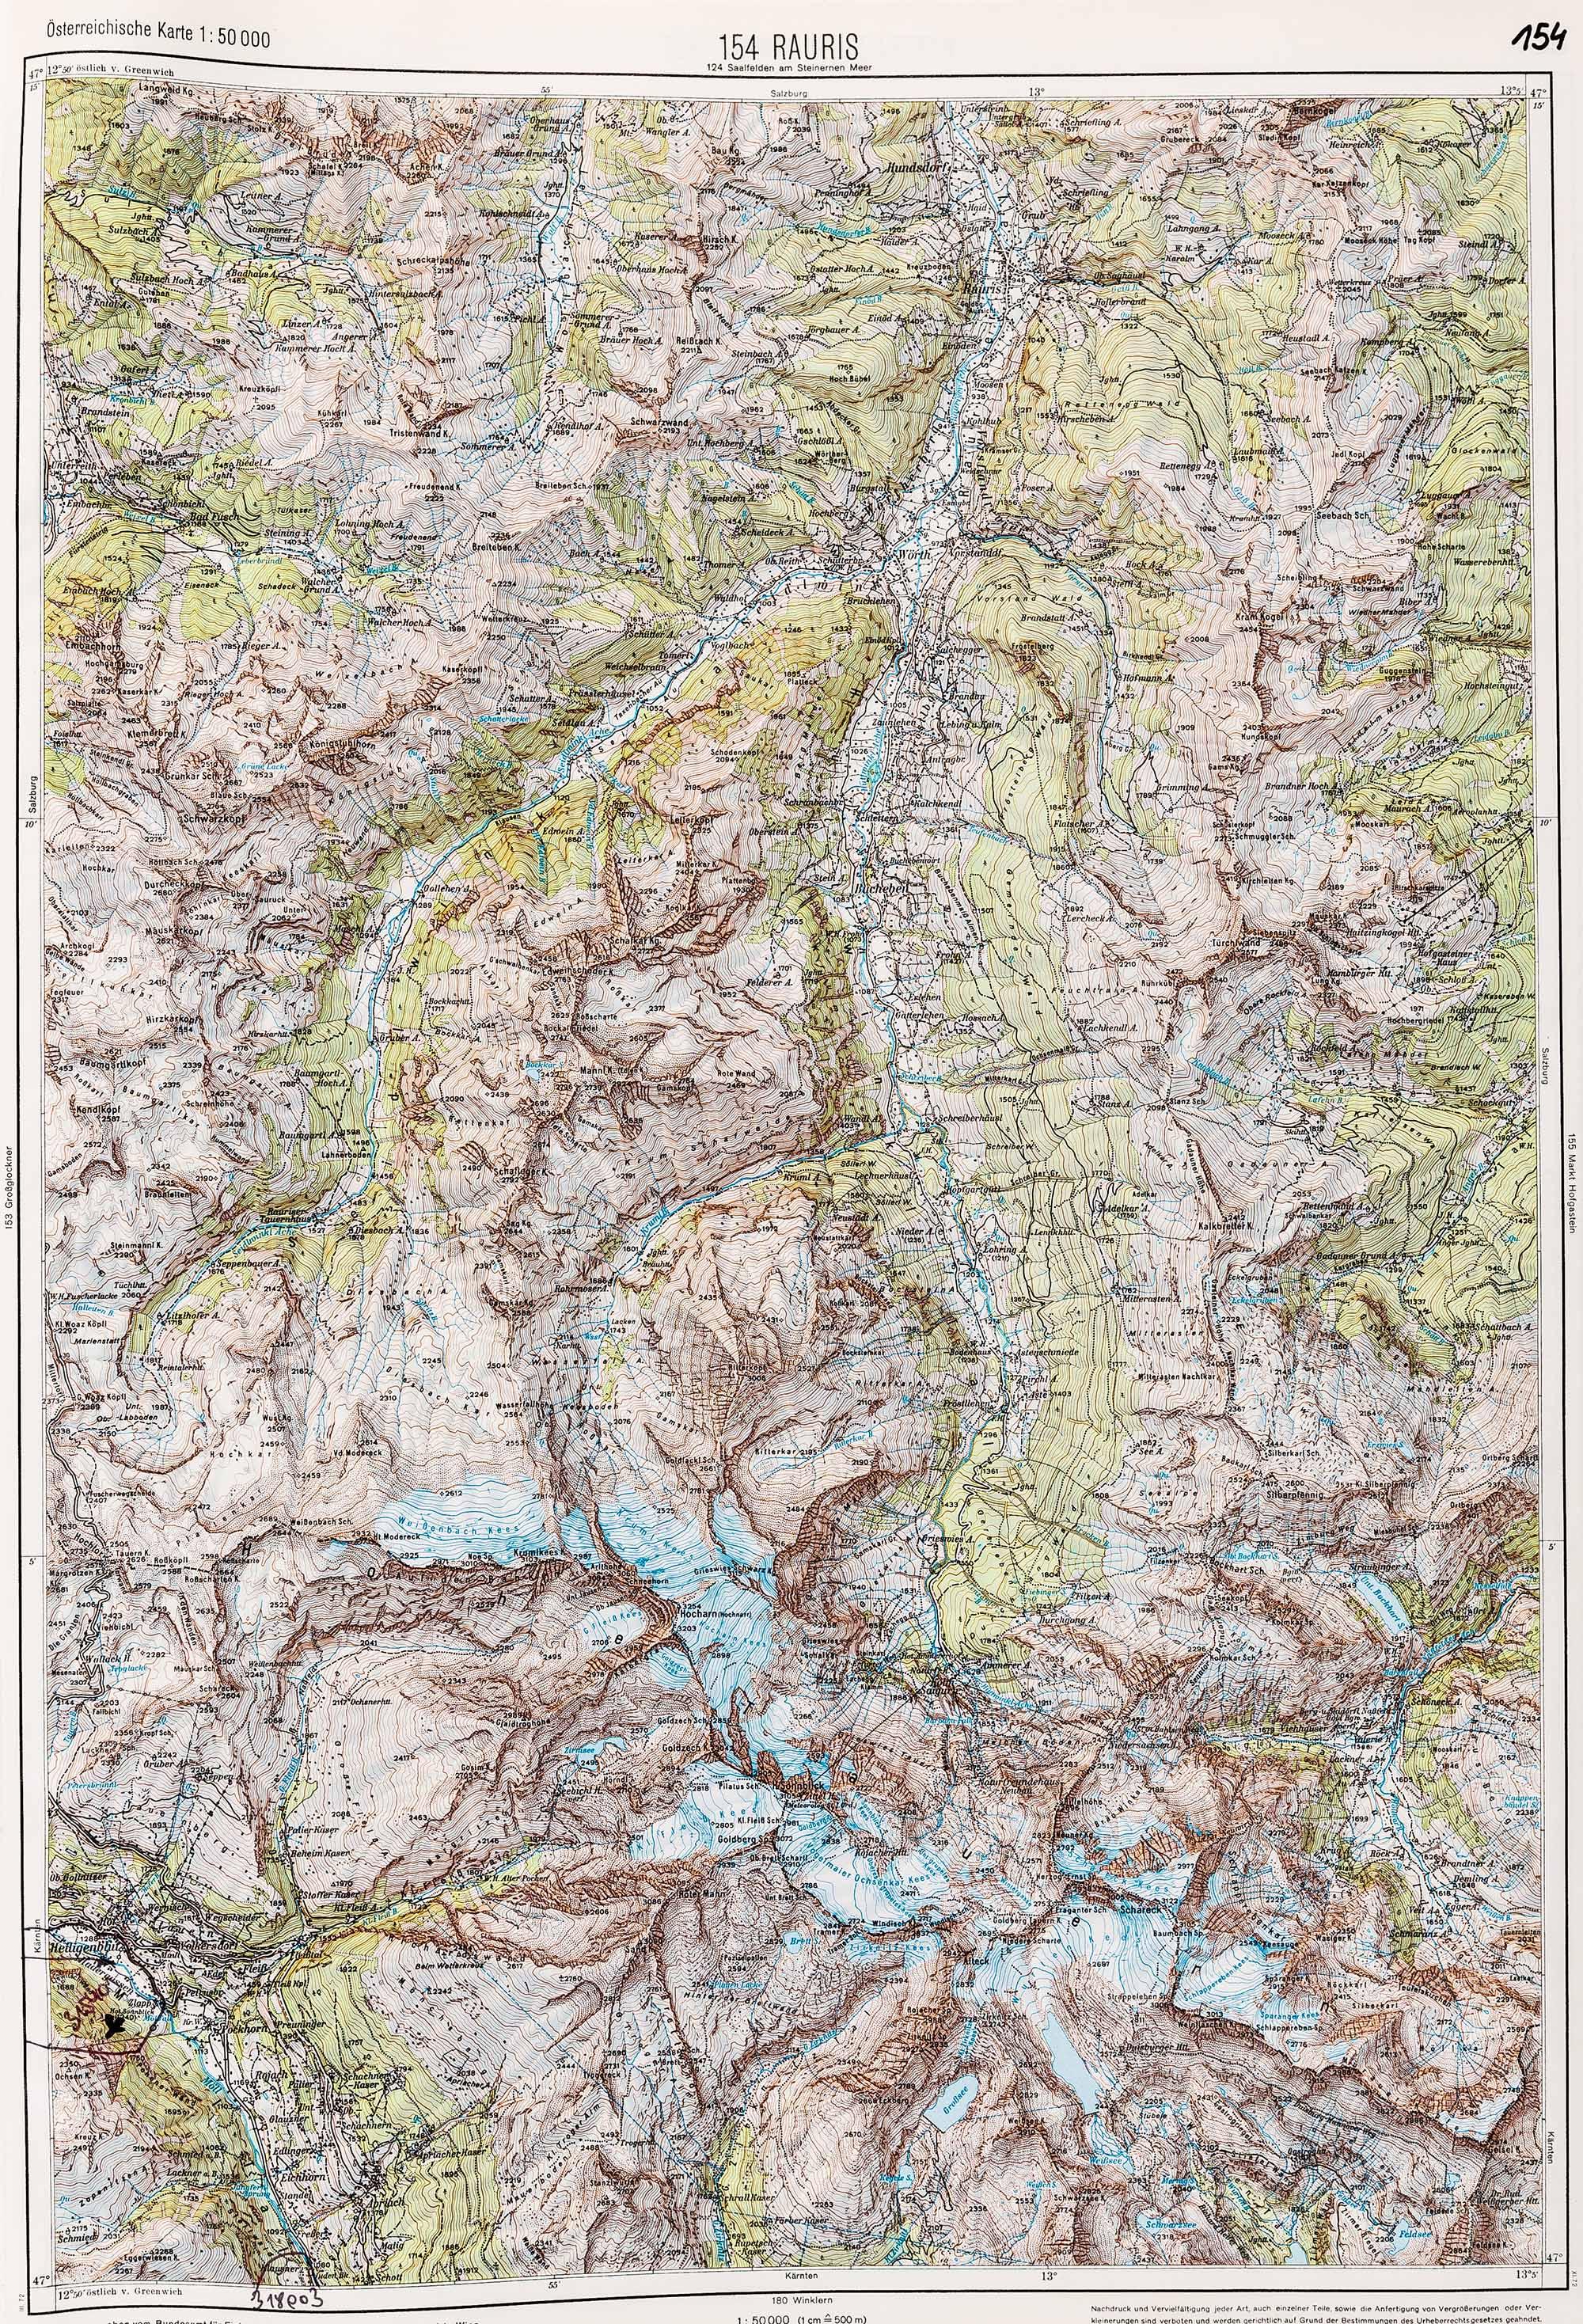 1983-1986 Karte 154